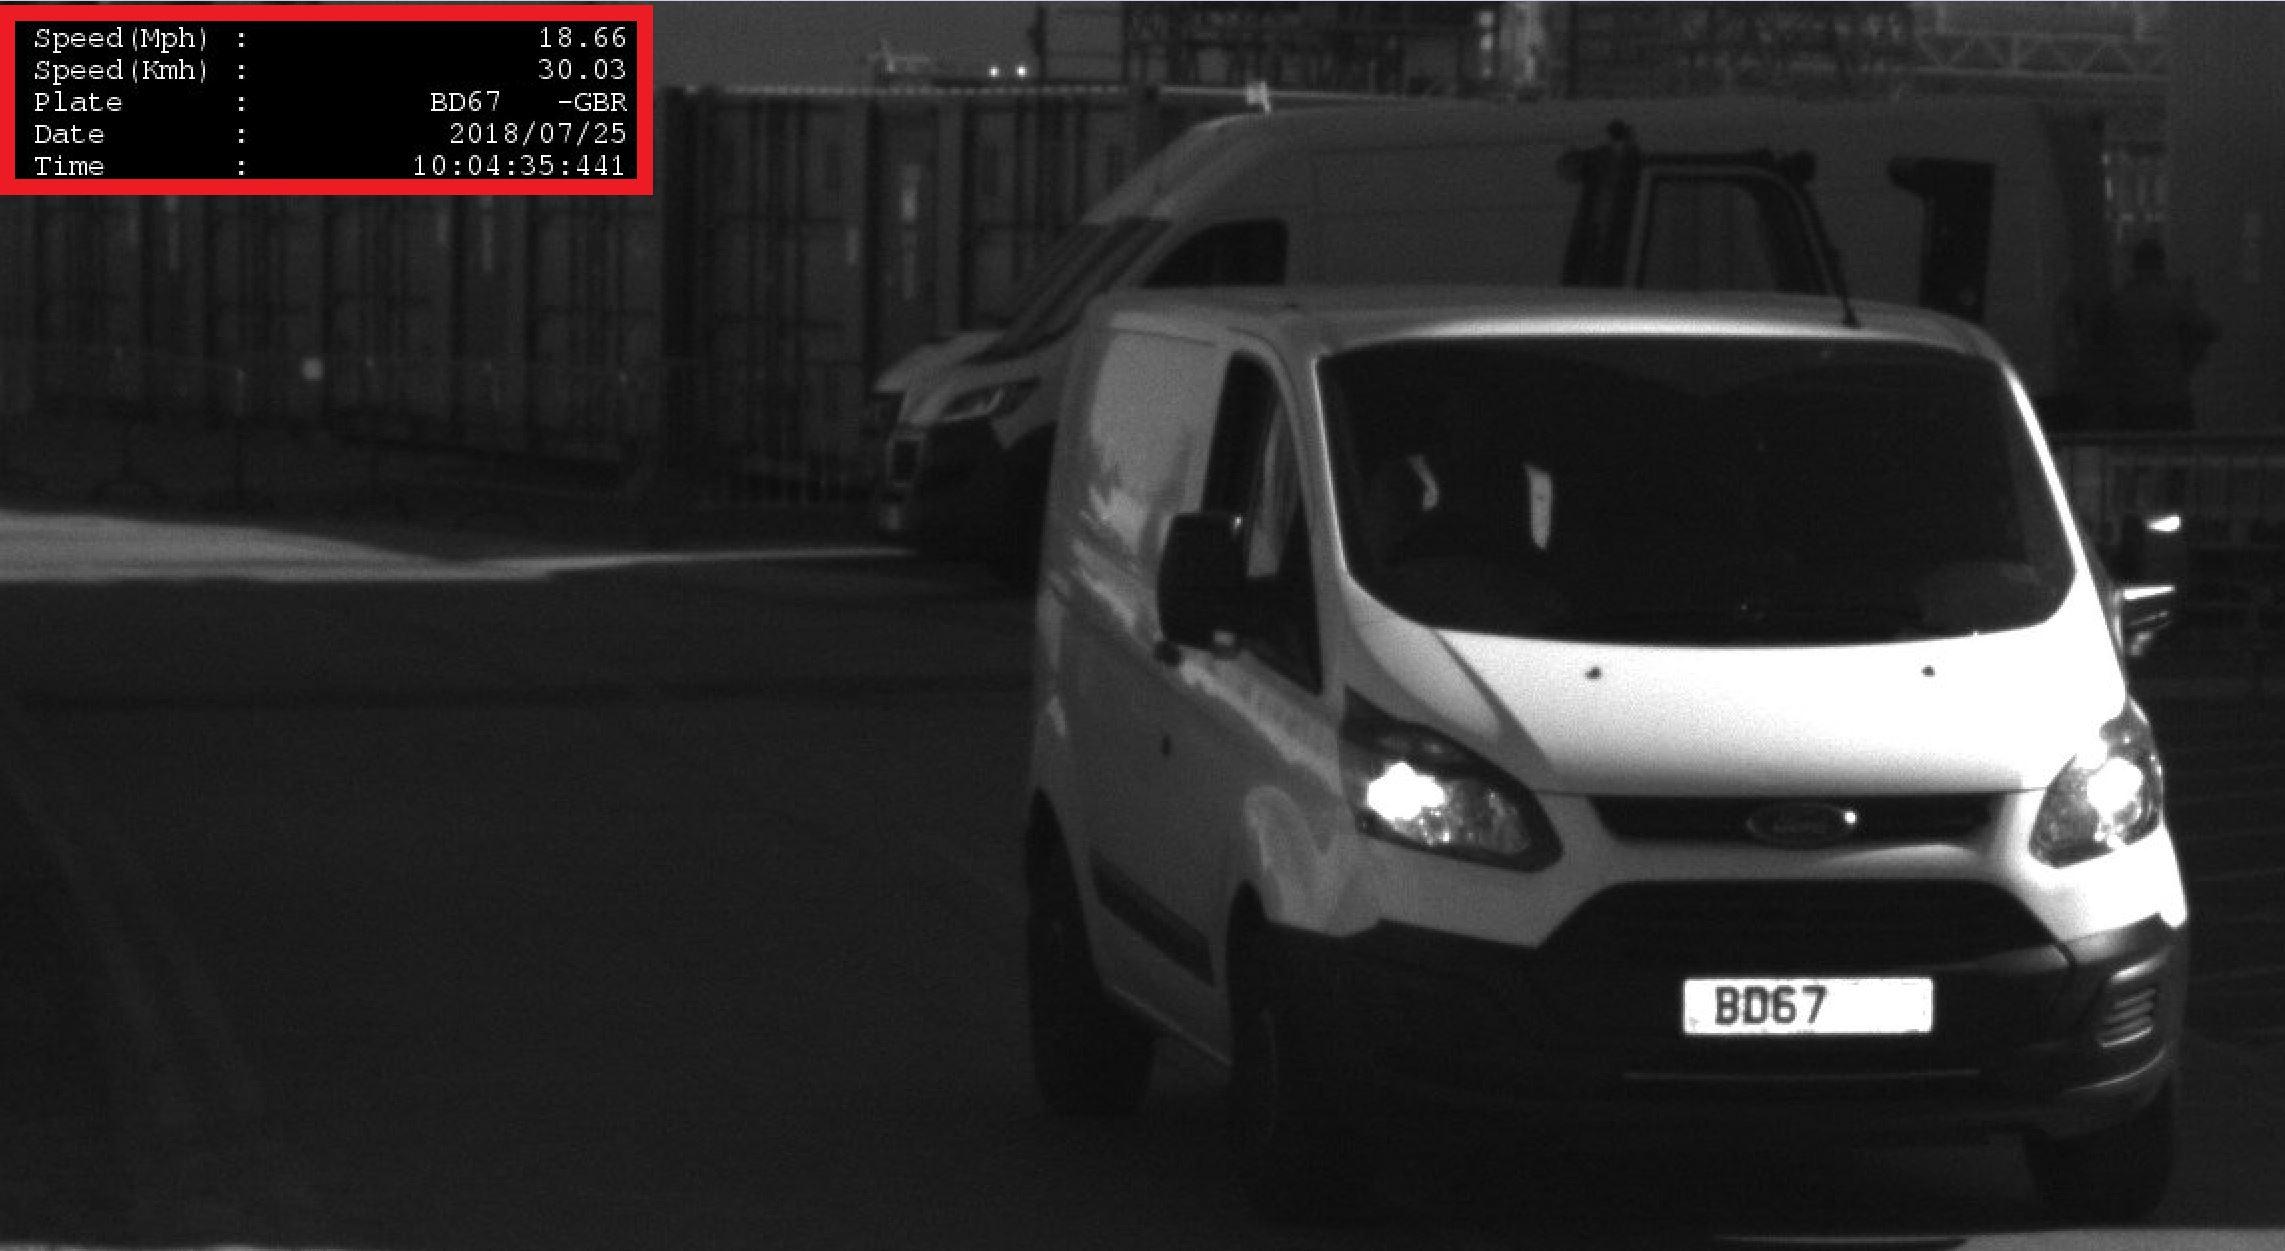 ANPR Speed Camera Vehicle